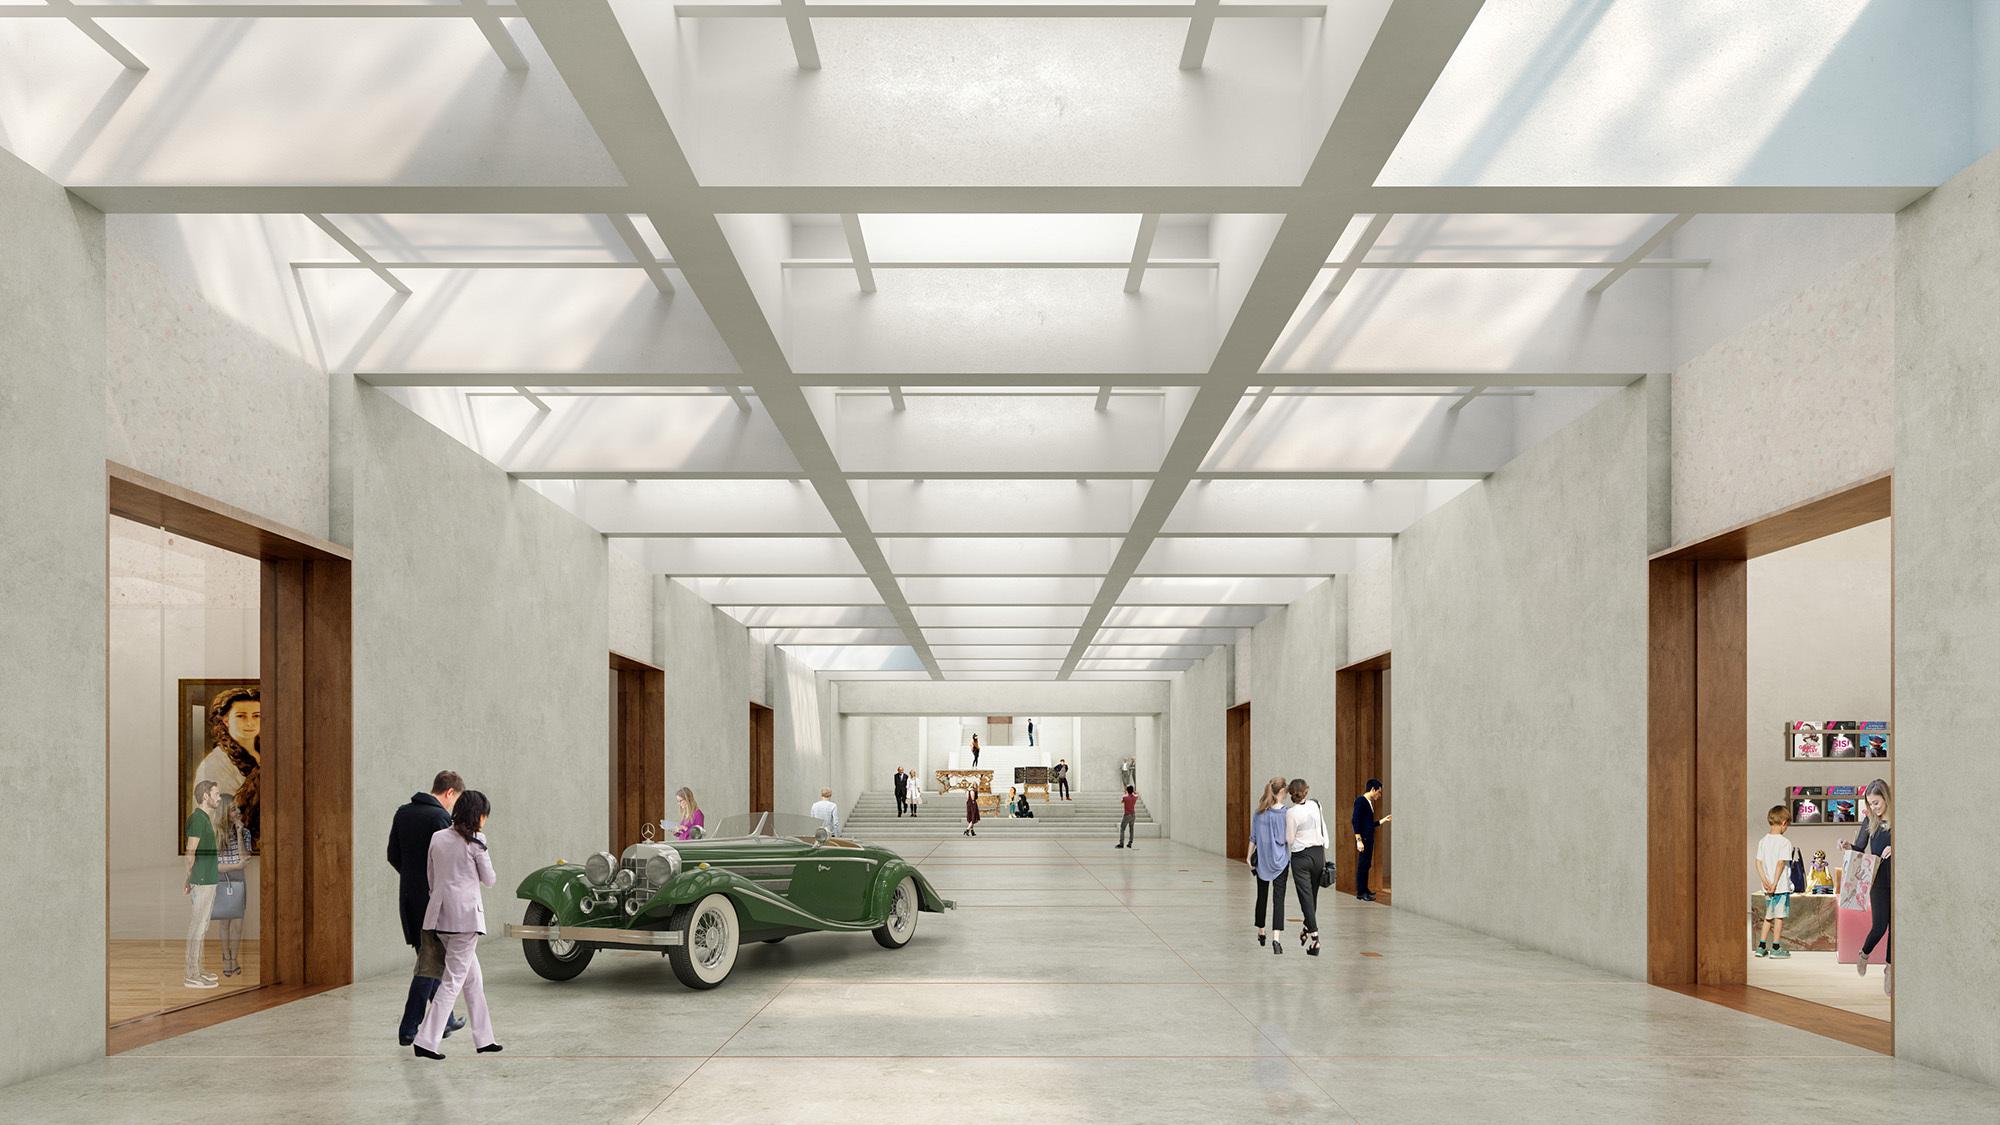 Museum Entry Foyer : Apeldoorn s renowned museum paleis het loo to be expanded